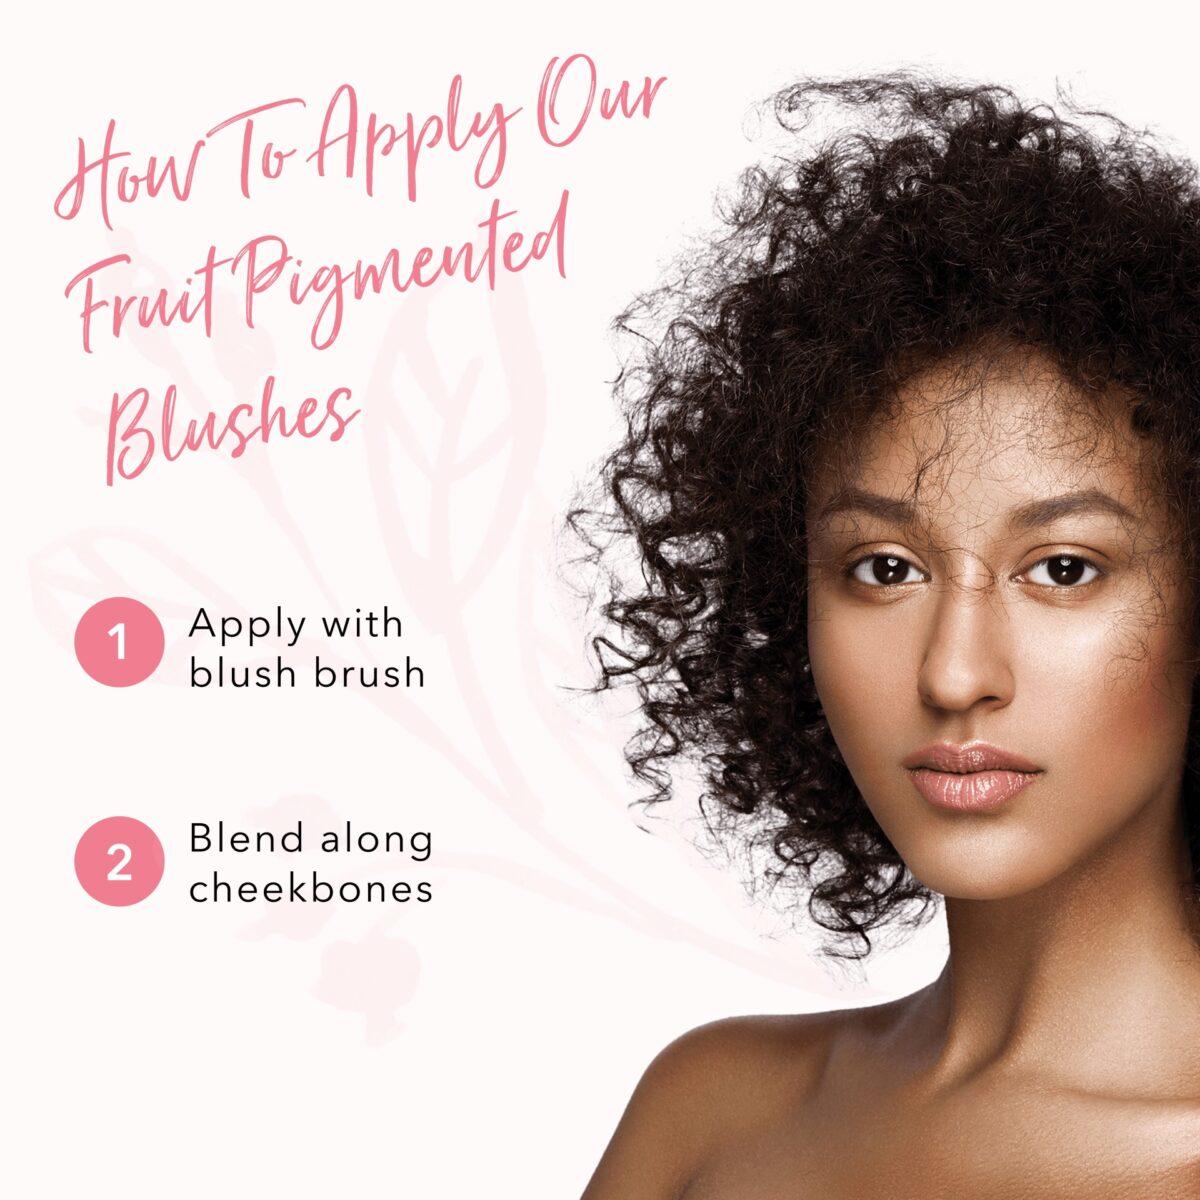 Fruit Pigmented® Blush Blush Face